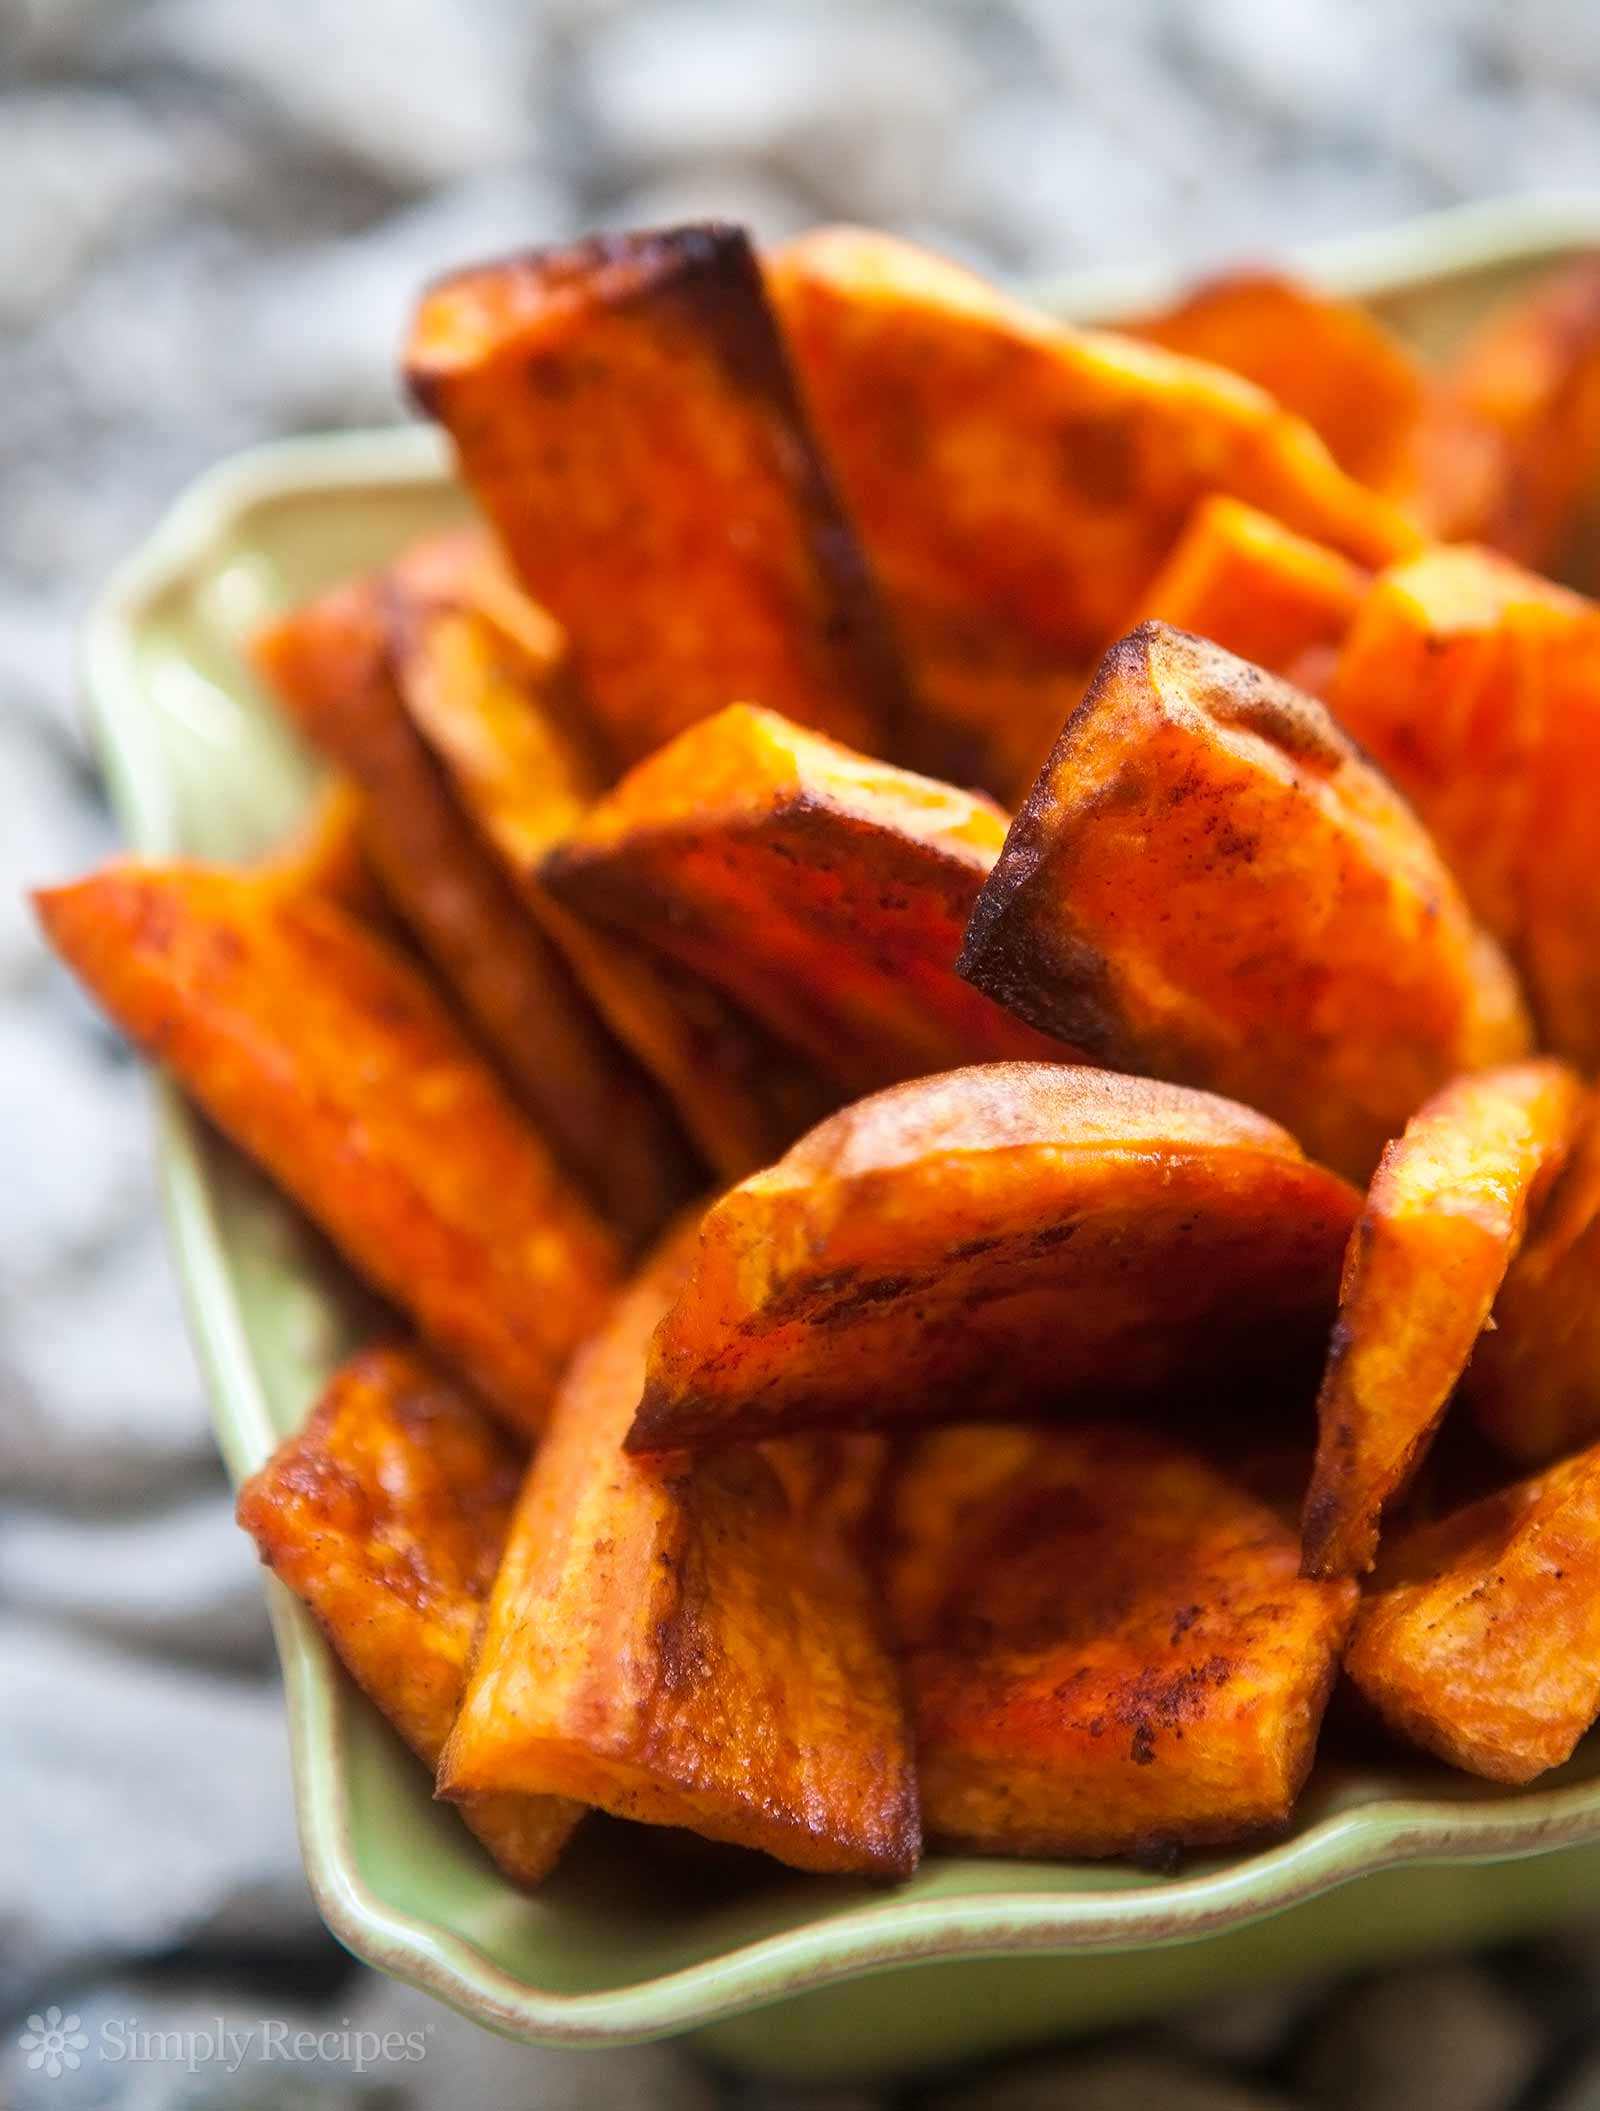 Roasted Sweet Potato Recipe  Oven Baked Sweet Potato Fries Recipe